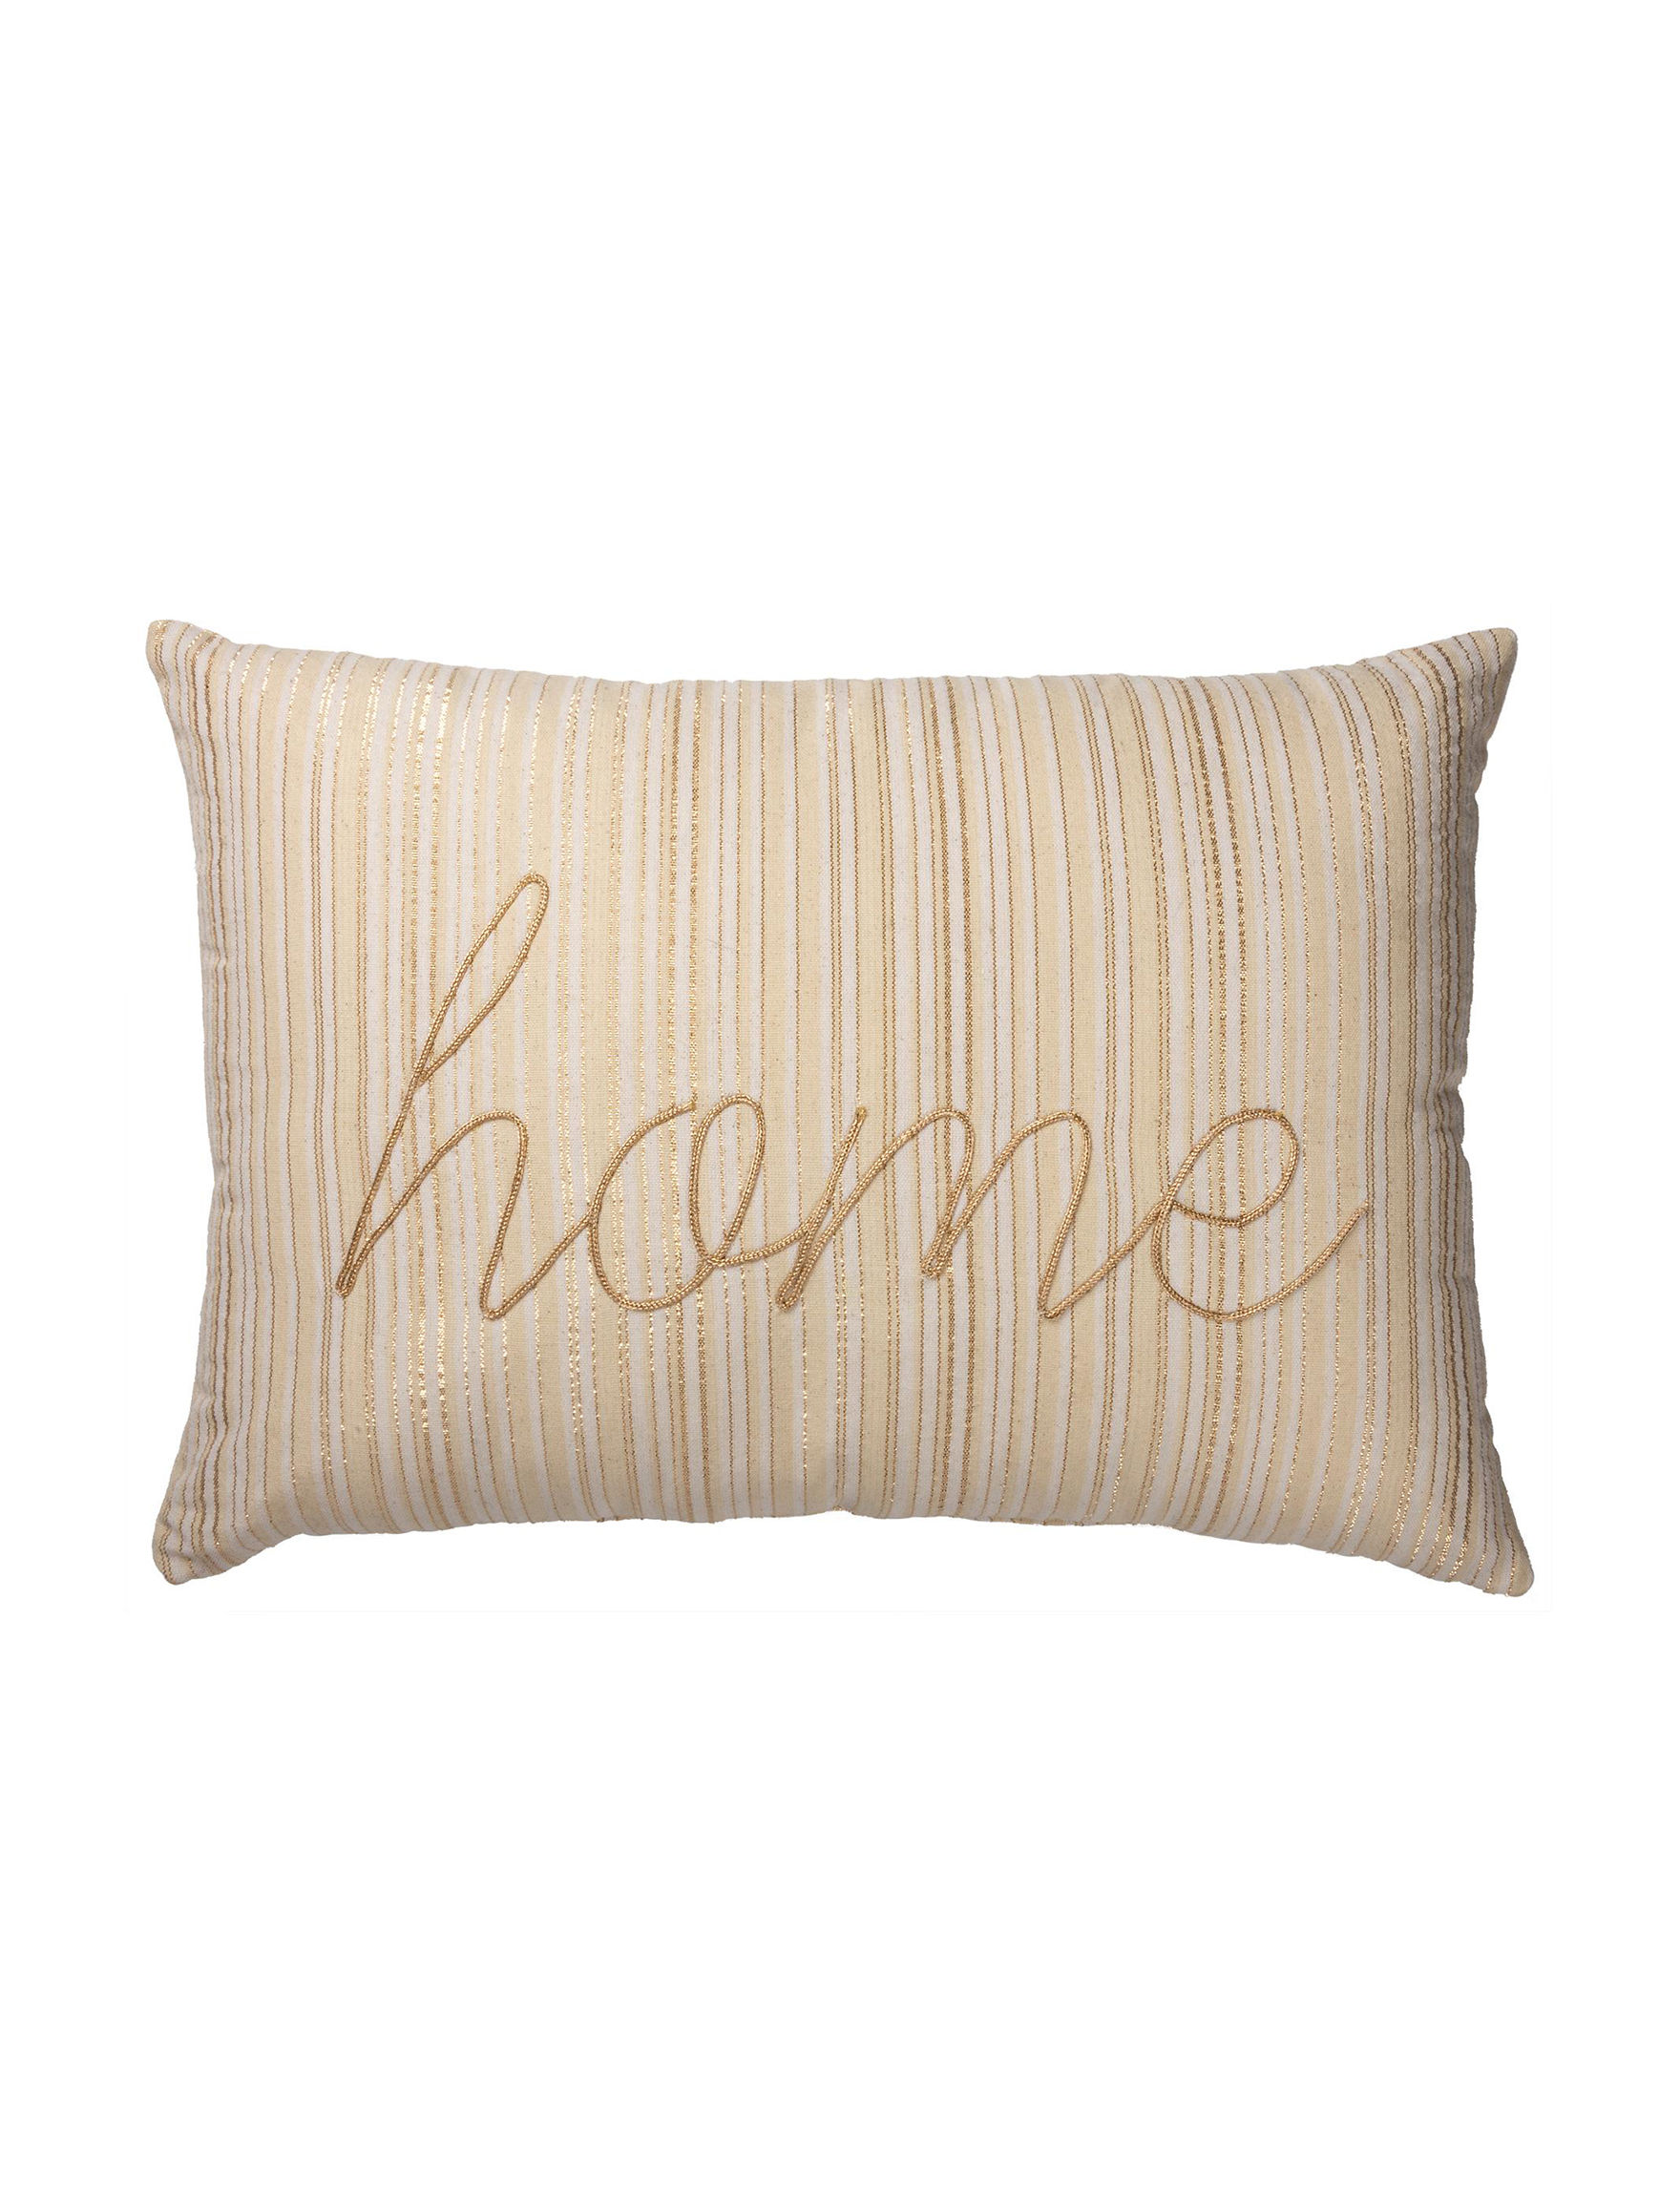 Primitives by Kathy Ivory Stripe Decorative Pillows